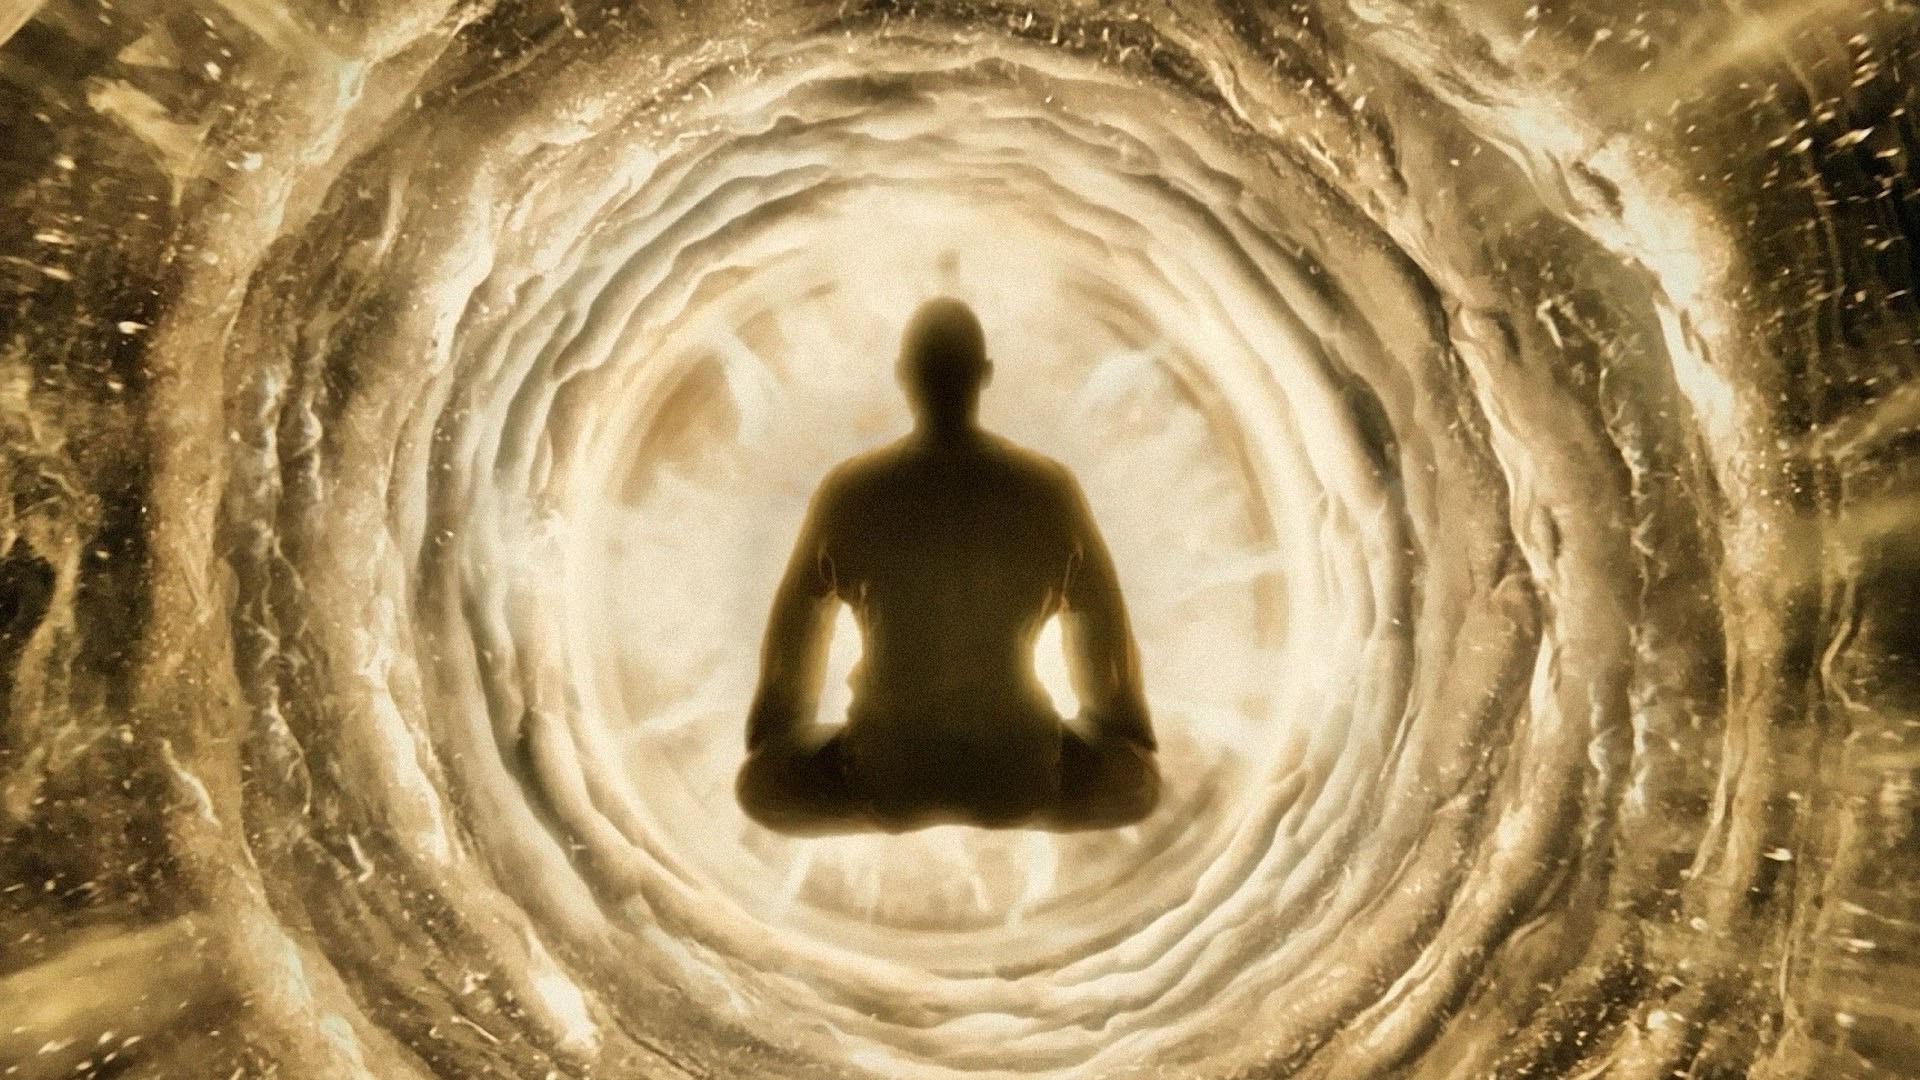 Buddha Iphone 6 Wallpaper Meditation Wallpaper 183 ① Download Free Beautiful Wallpapers